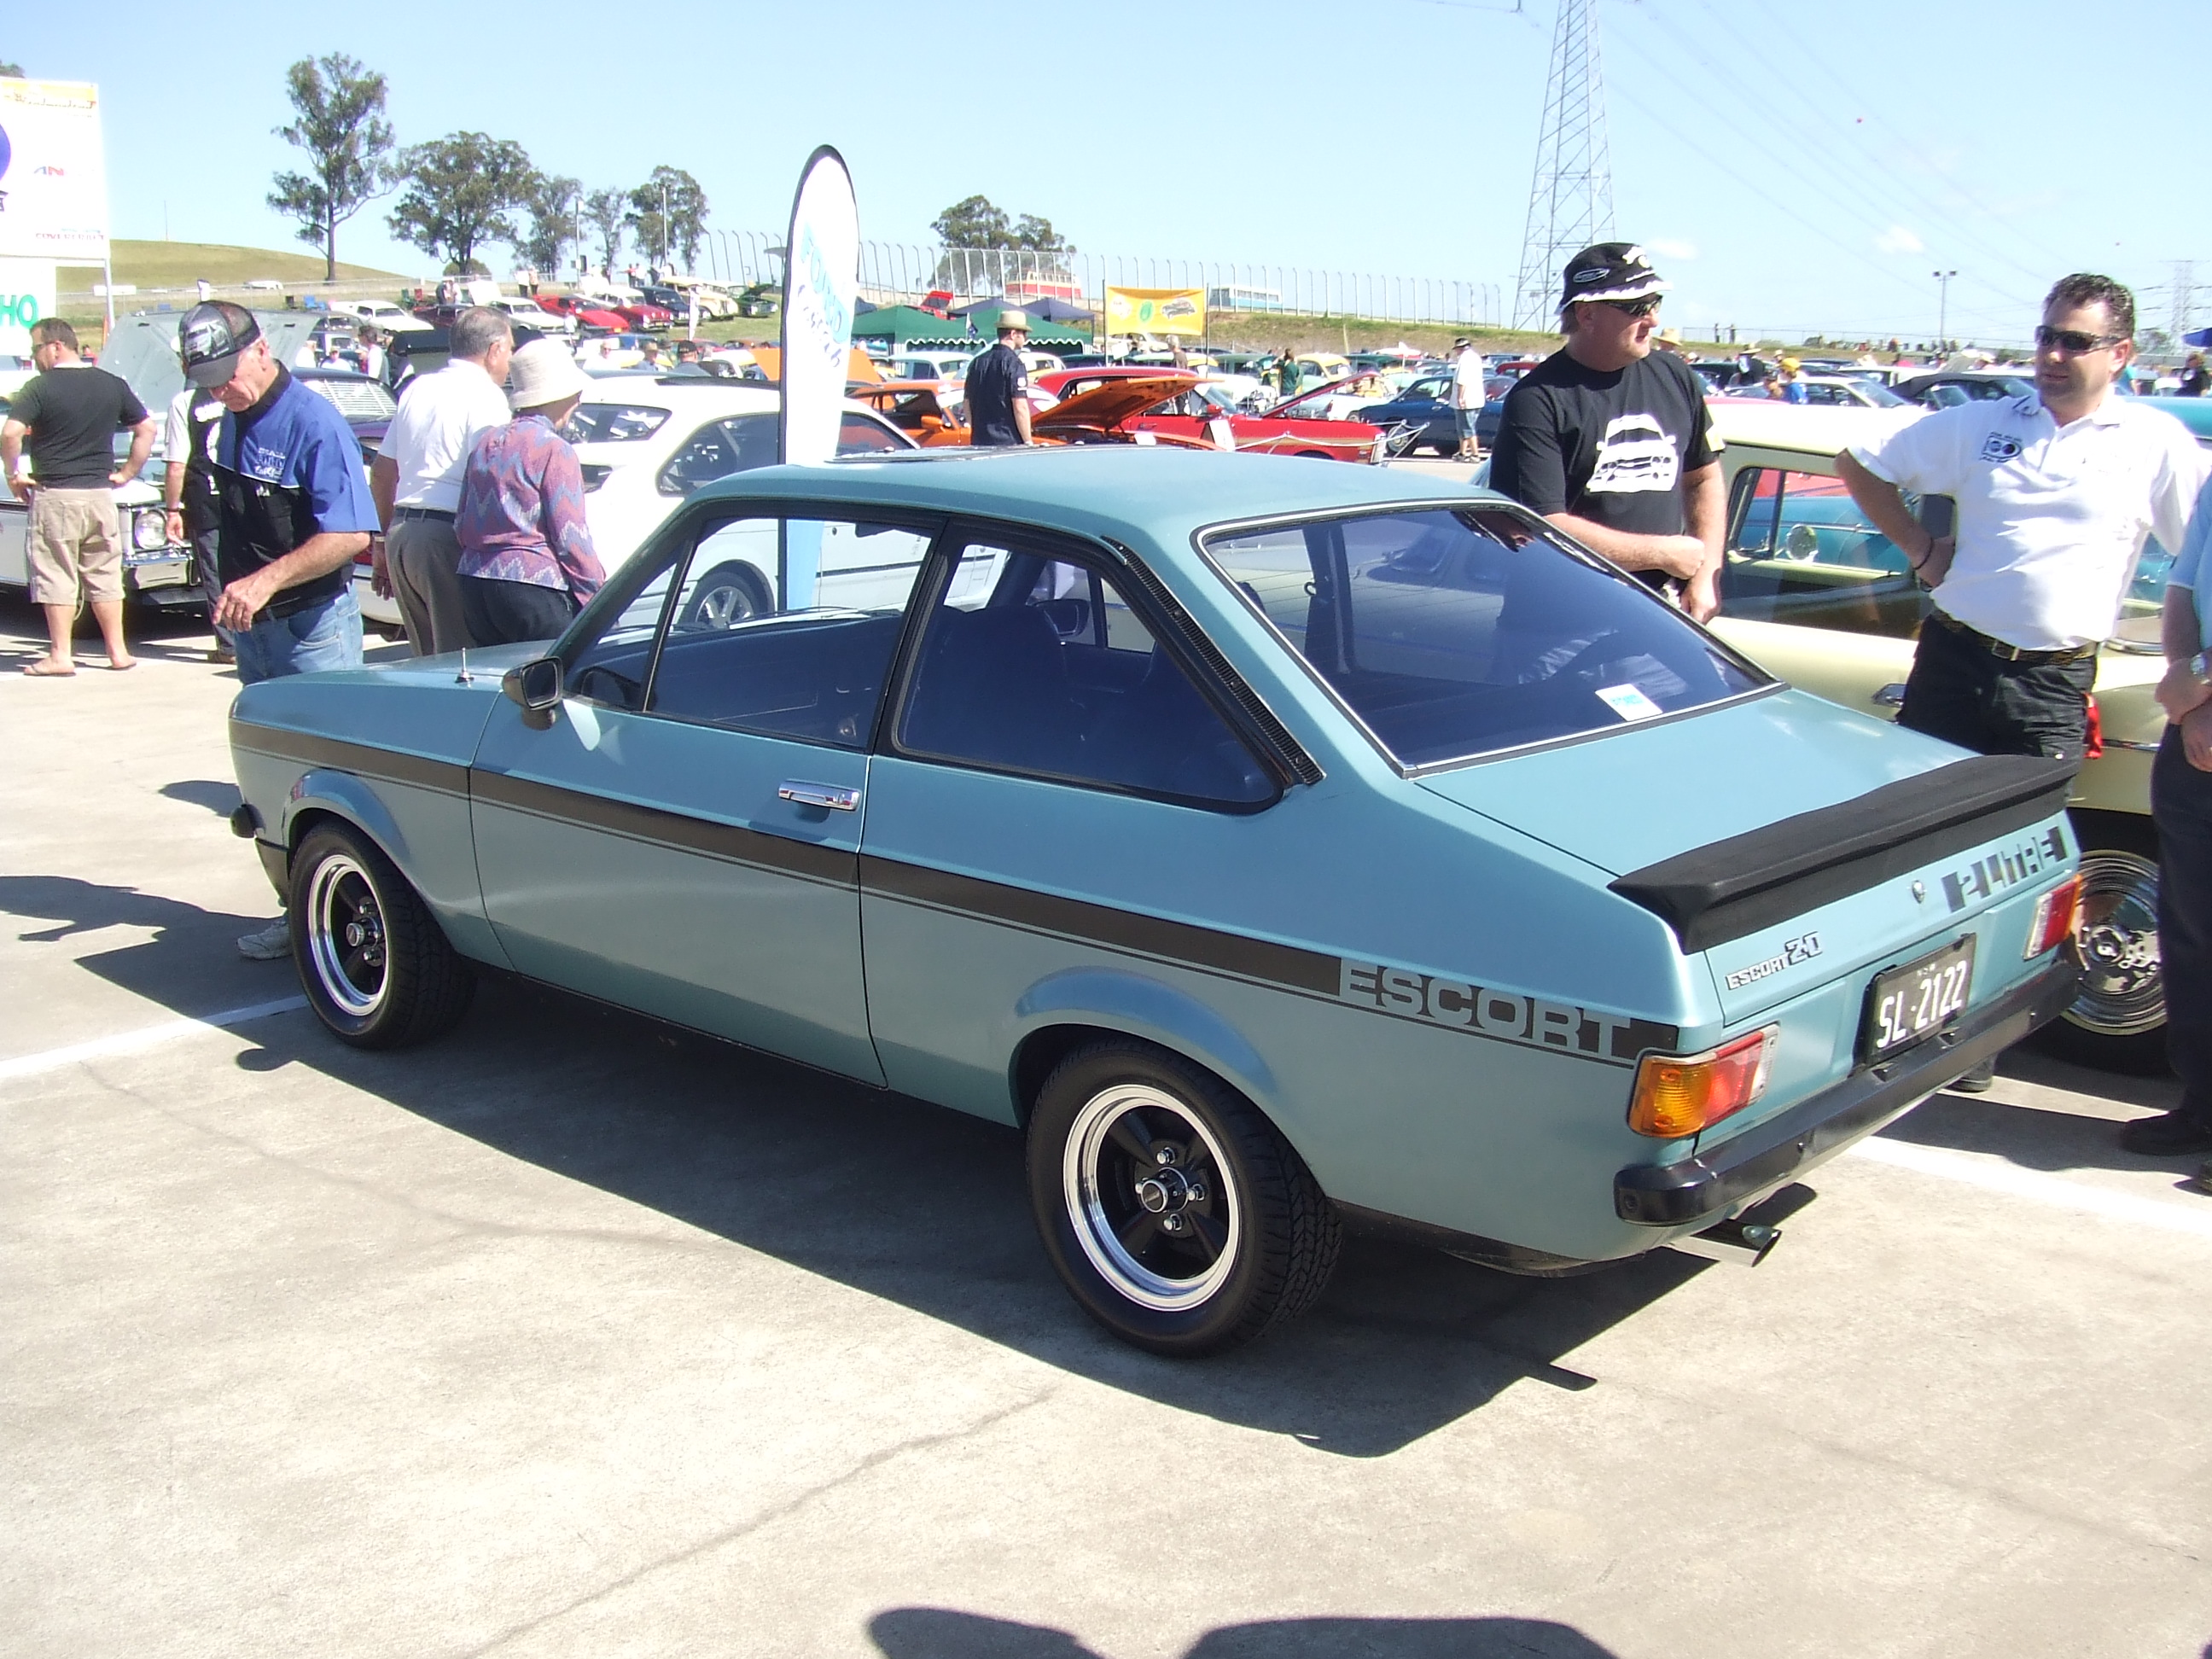 File:1978 Ford Escort (Mark II) GL Rally Pack 2.0 2-door sedan ...